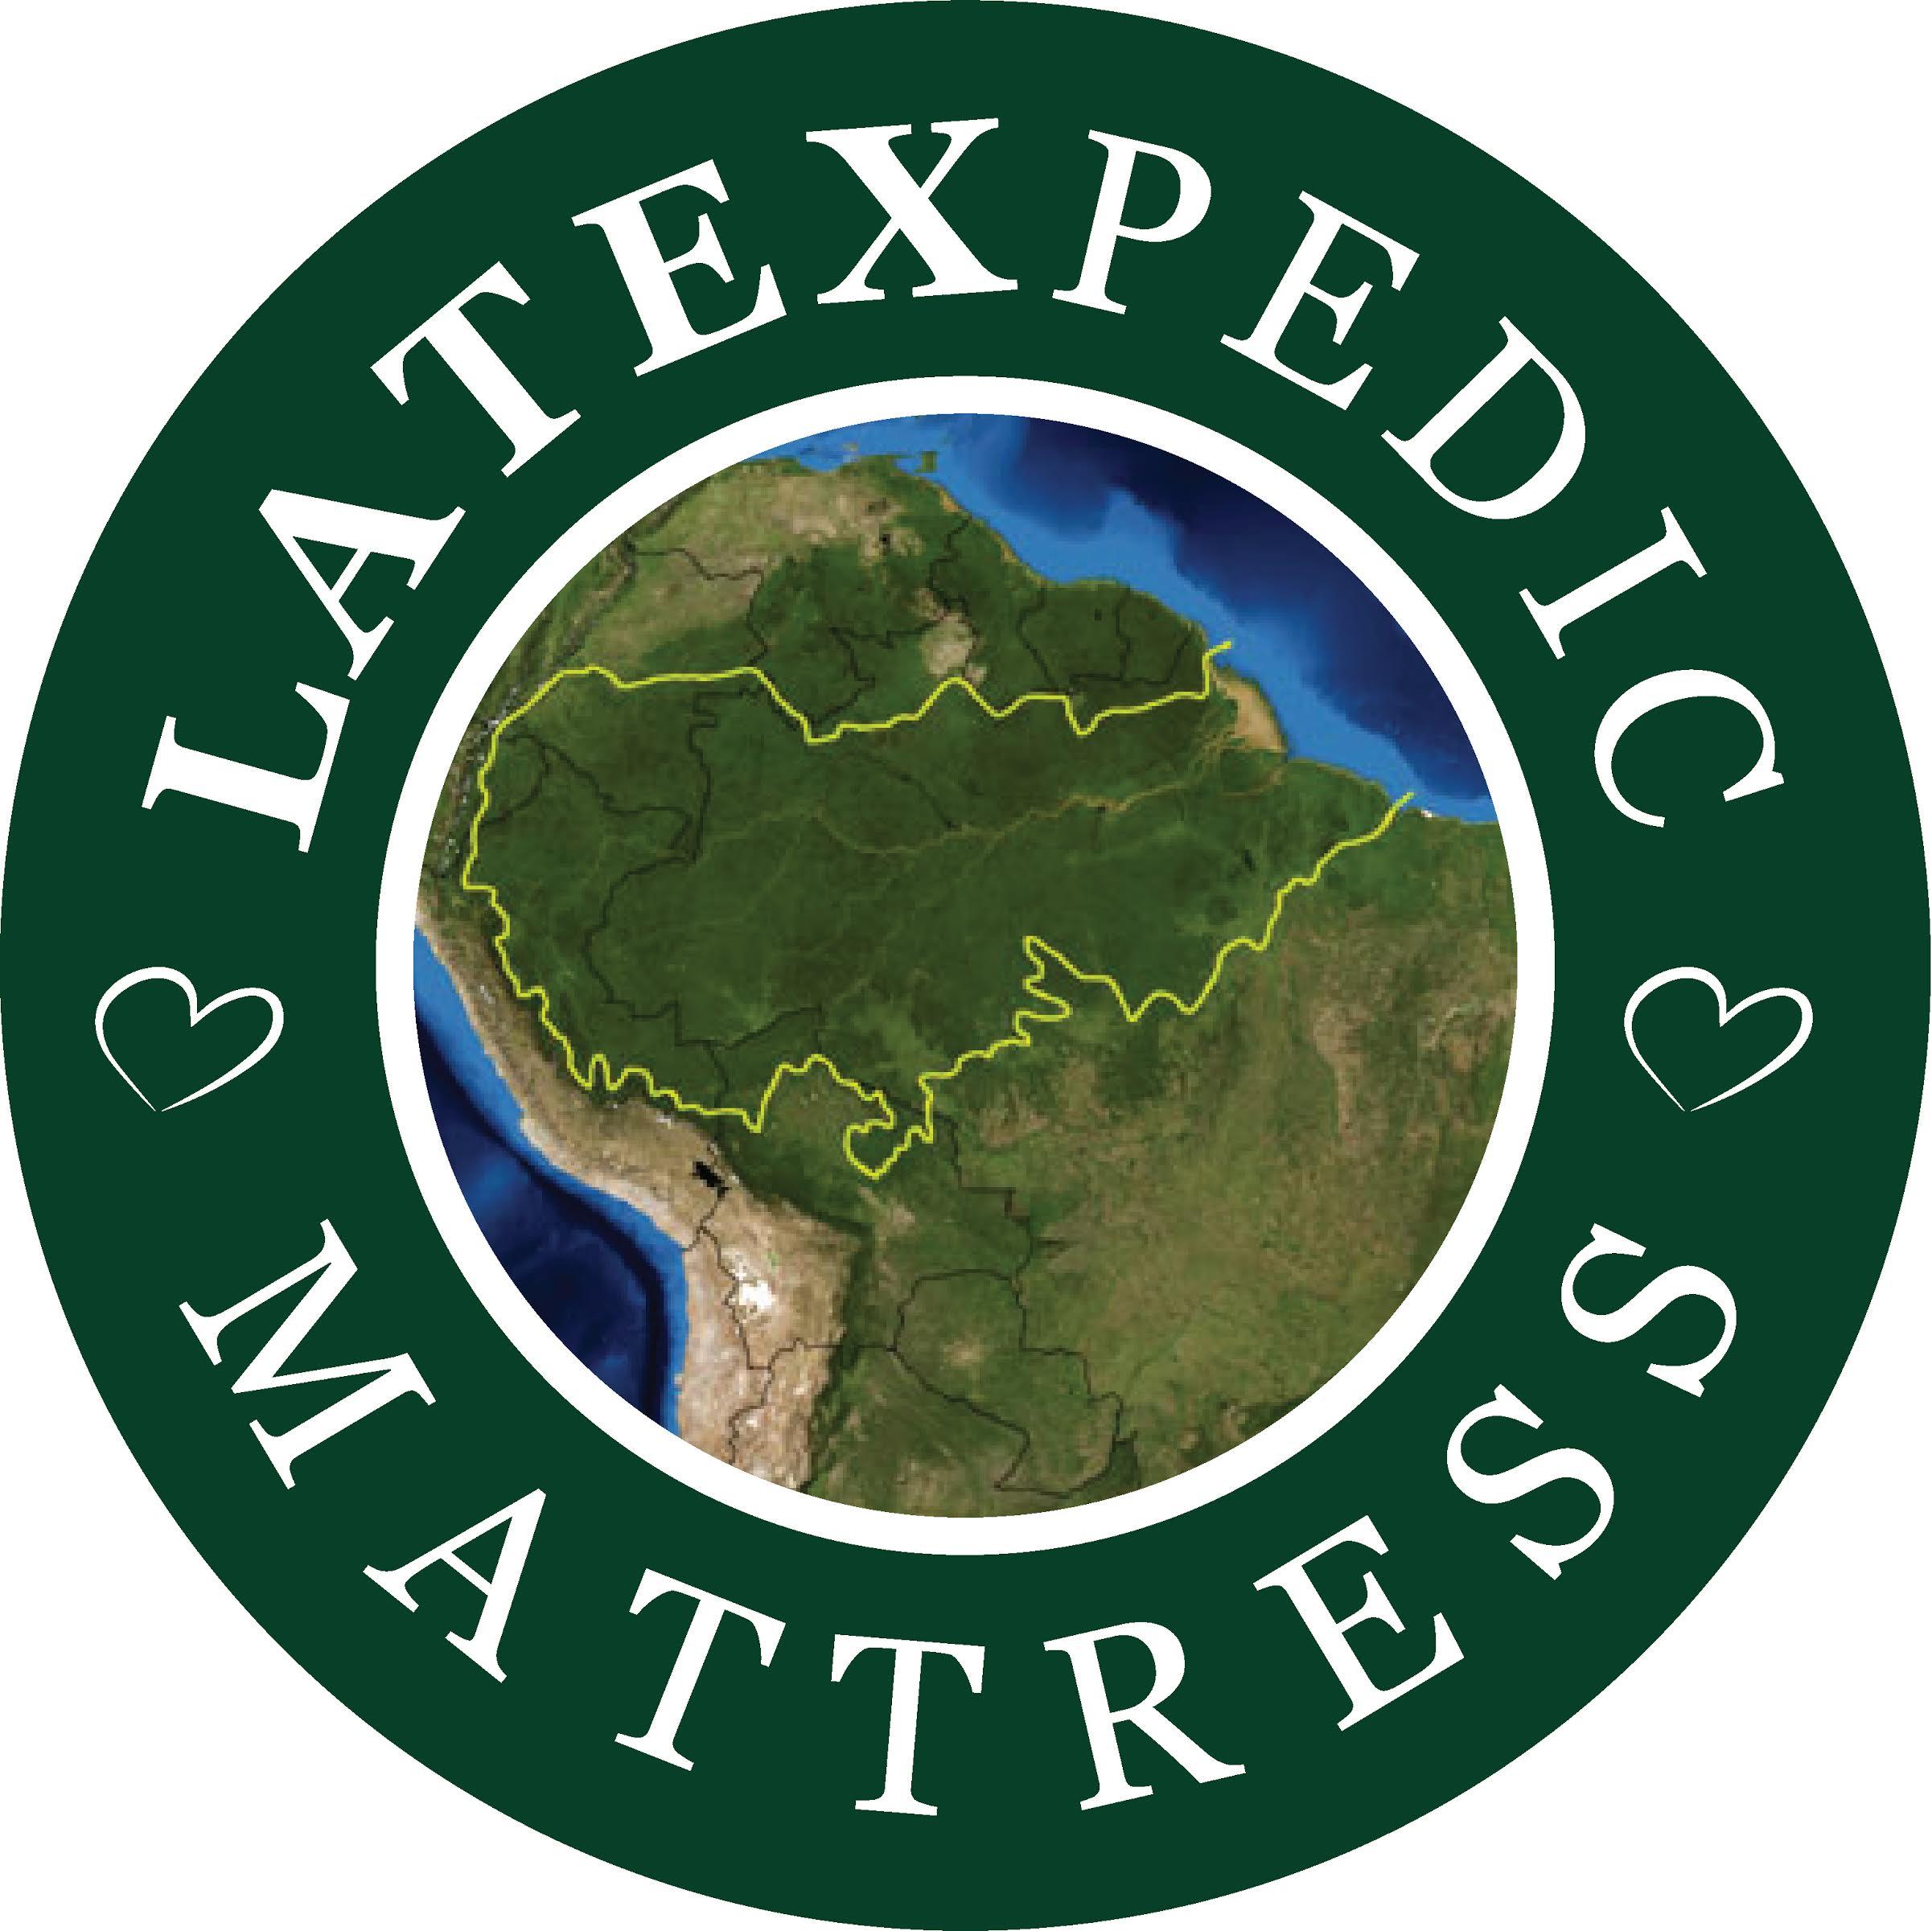 Latex Mattresses are originally native to the Amazon Rainforest